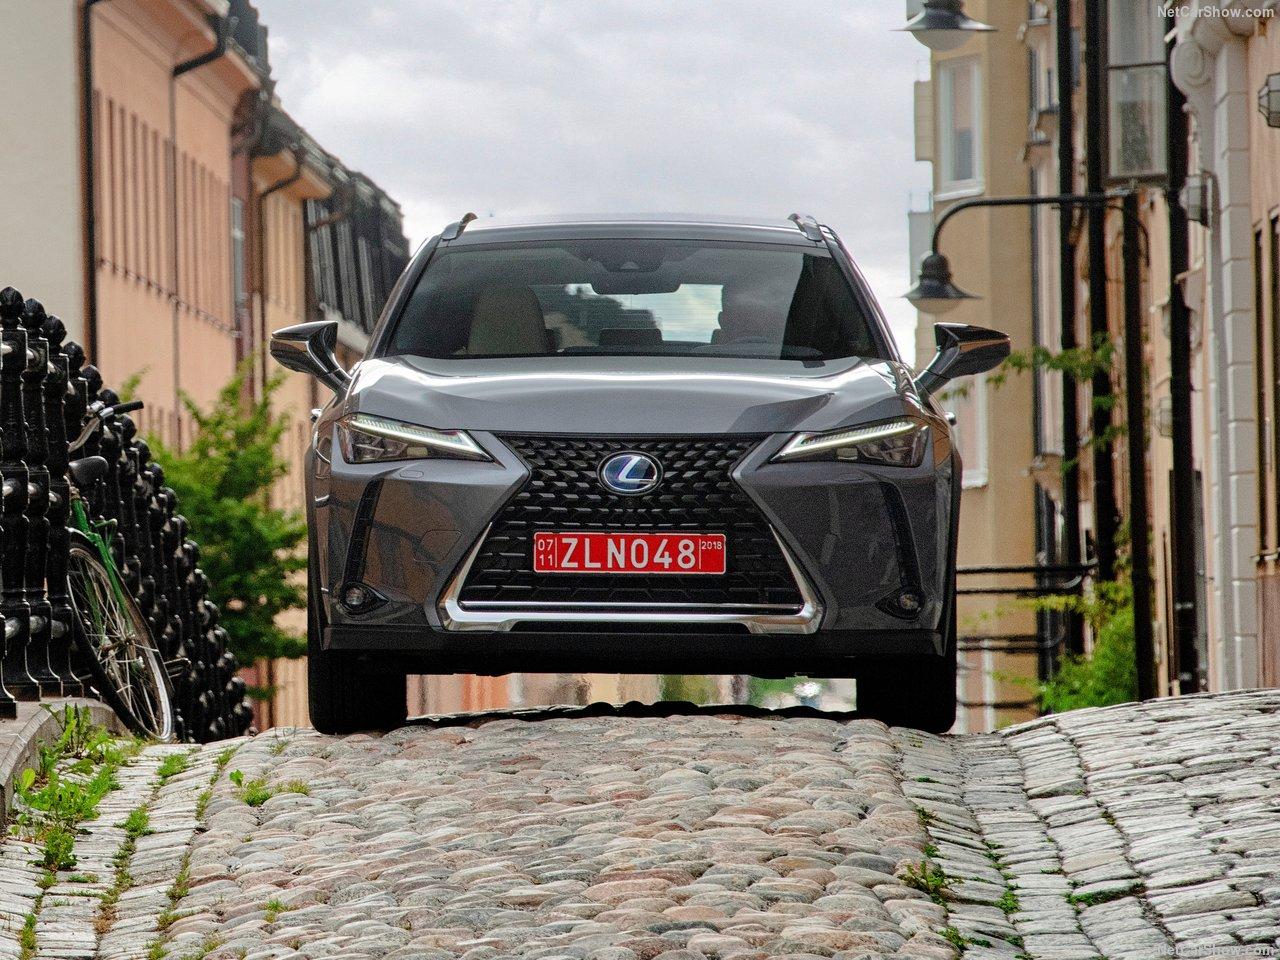 Lexus-UX-2019-1280-6a.jpg